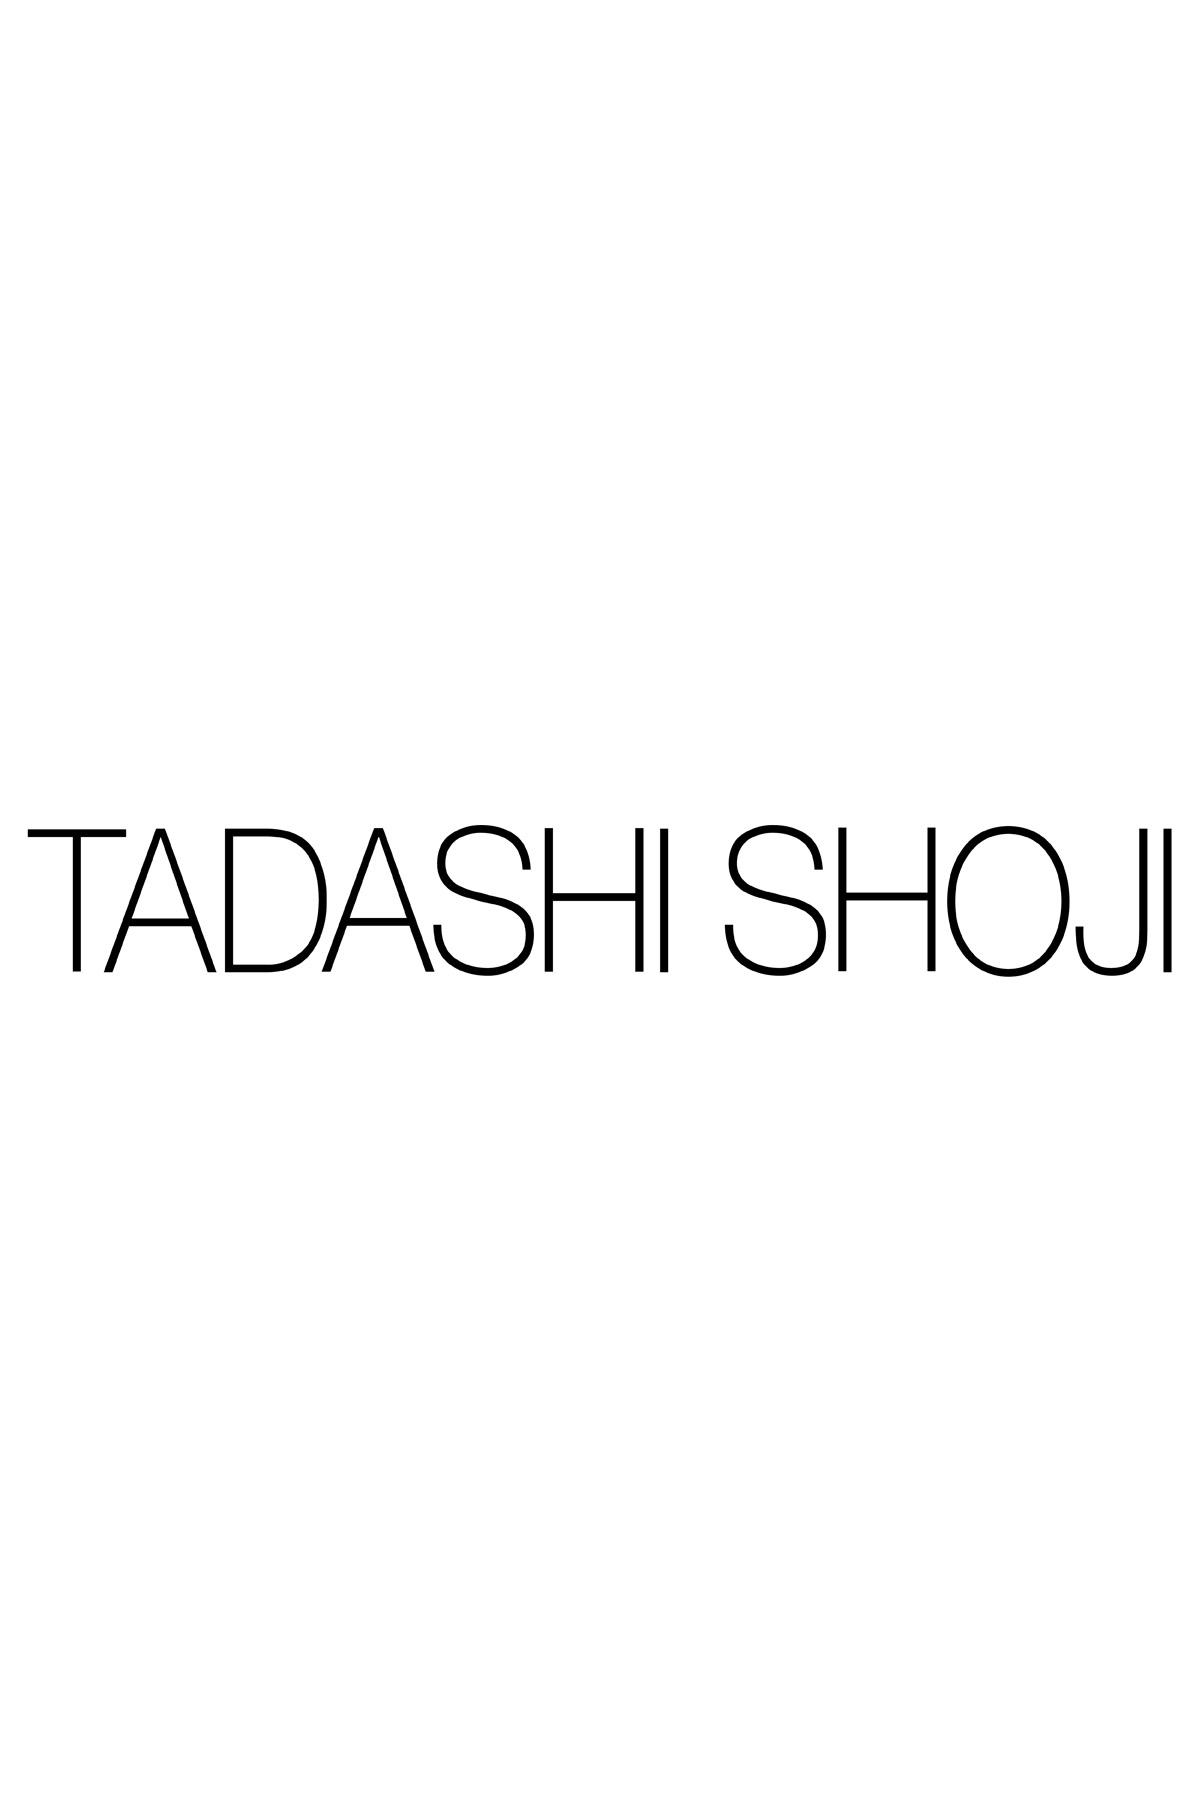 Tadashi Shoji - Karelo Ruffled Crepe Dress - PLUS SIZE